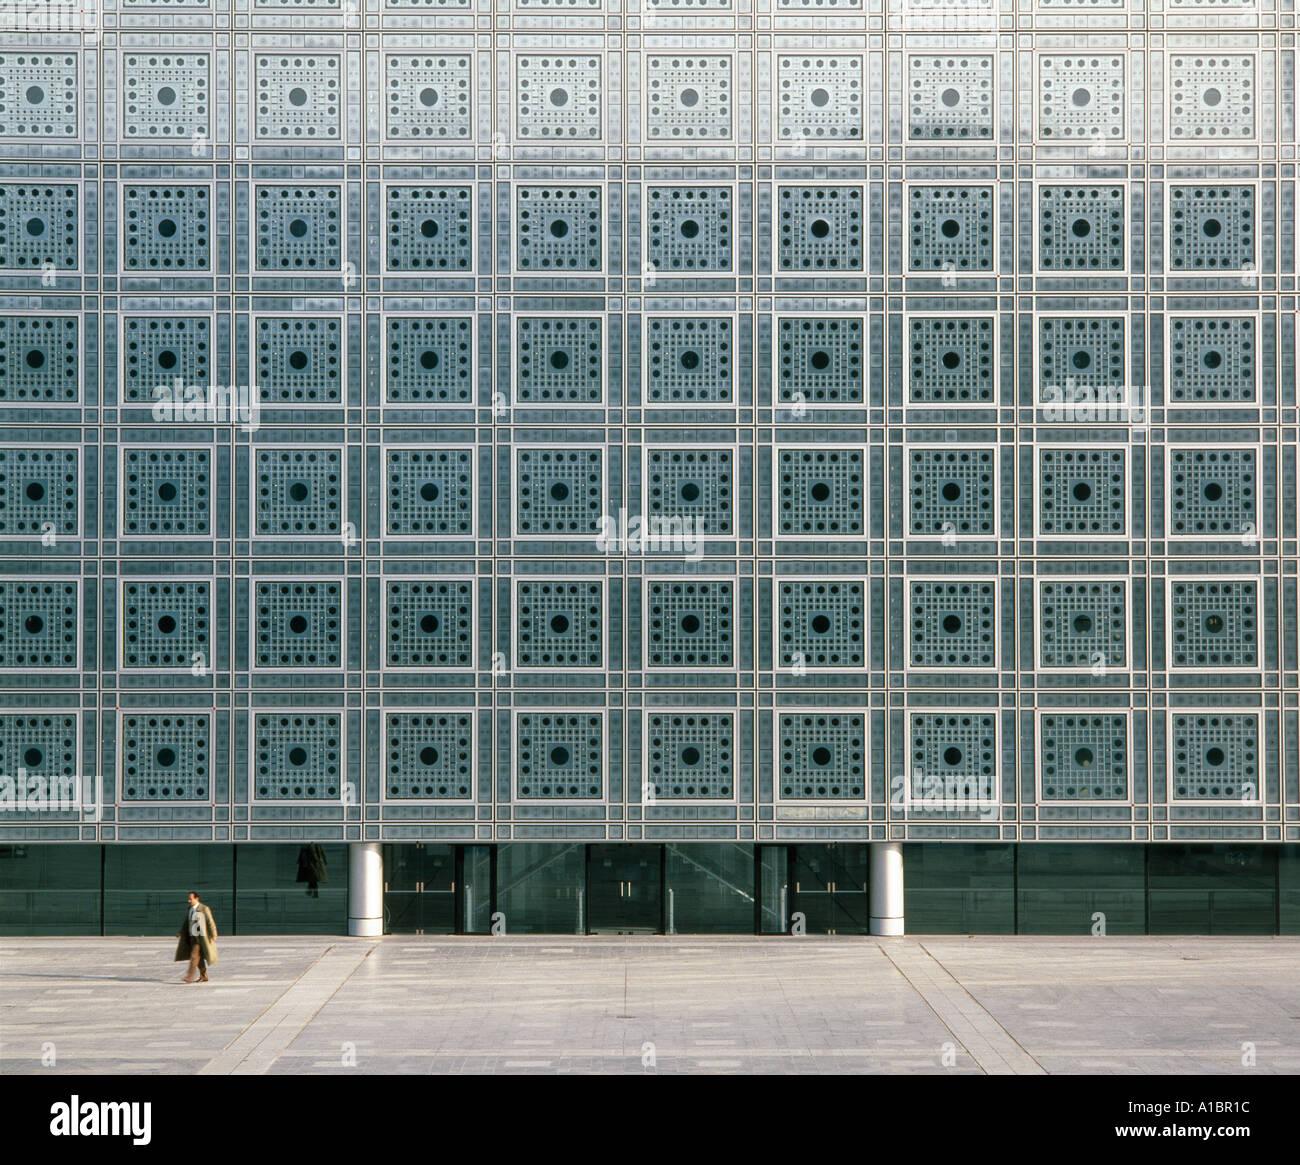 O Institut du Monde Árabe, fachada sul, Paris, 1987. Fotossensíveis telas na janela. Arquitecto: Jean Imagens de Stock